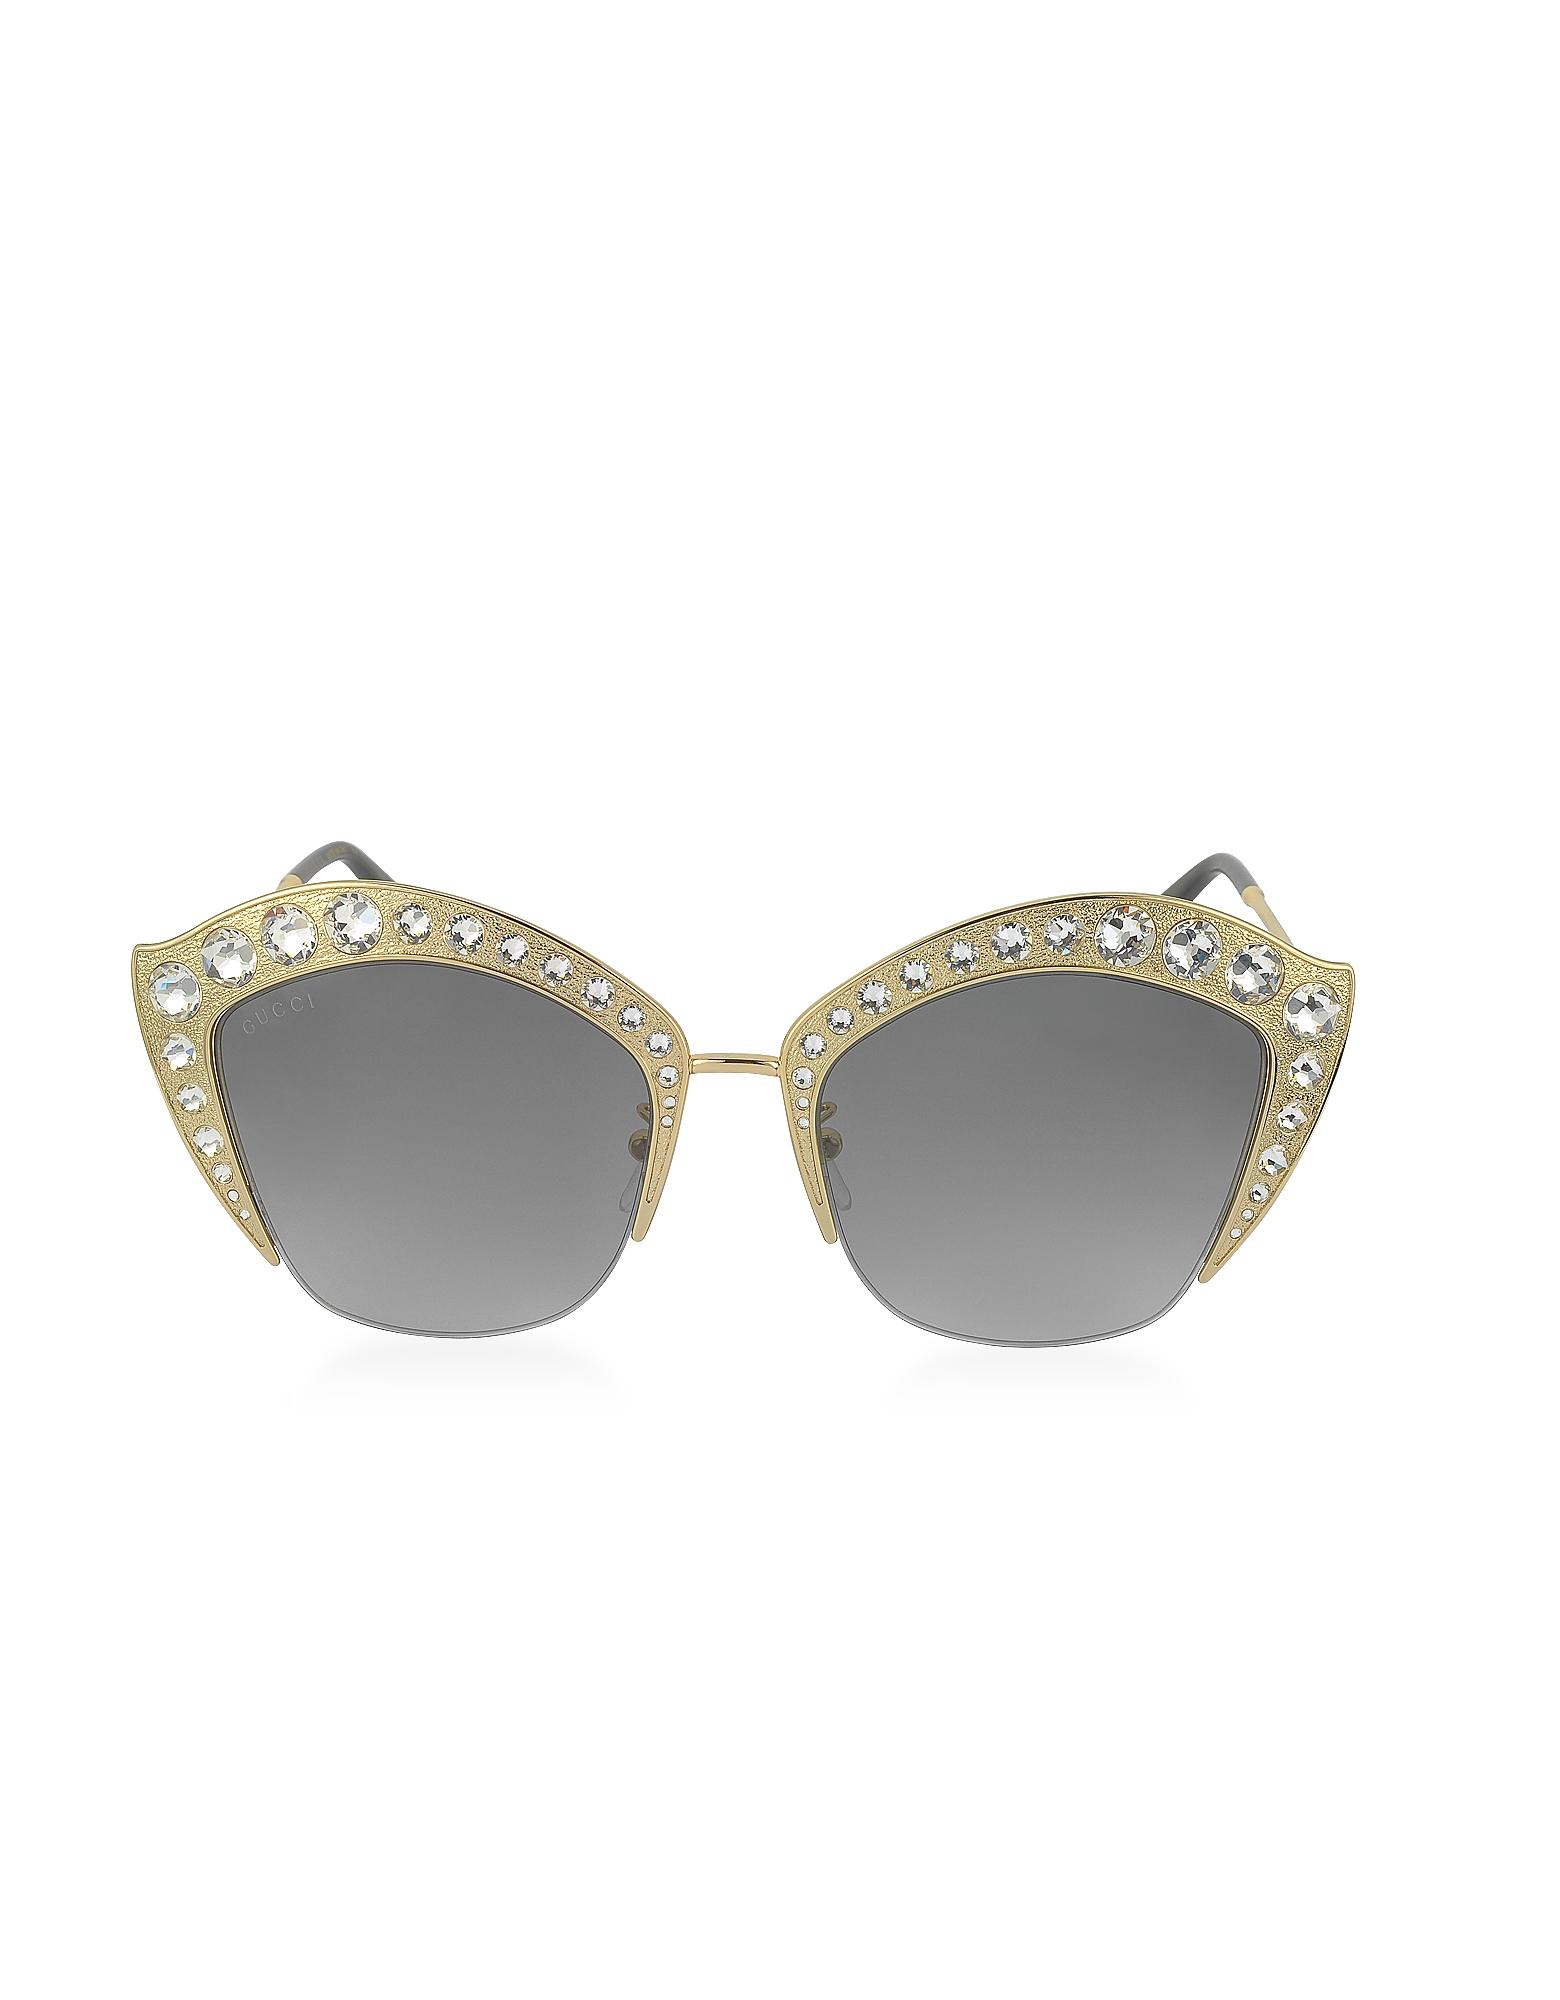 Gucci Designer Sunglasses, GG0114S Metal Cat Eye Women's Sunglasses w/Crystals